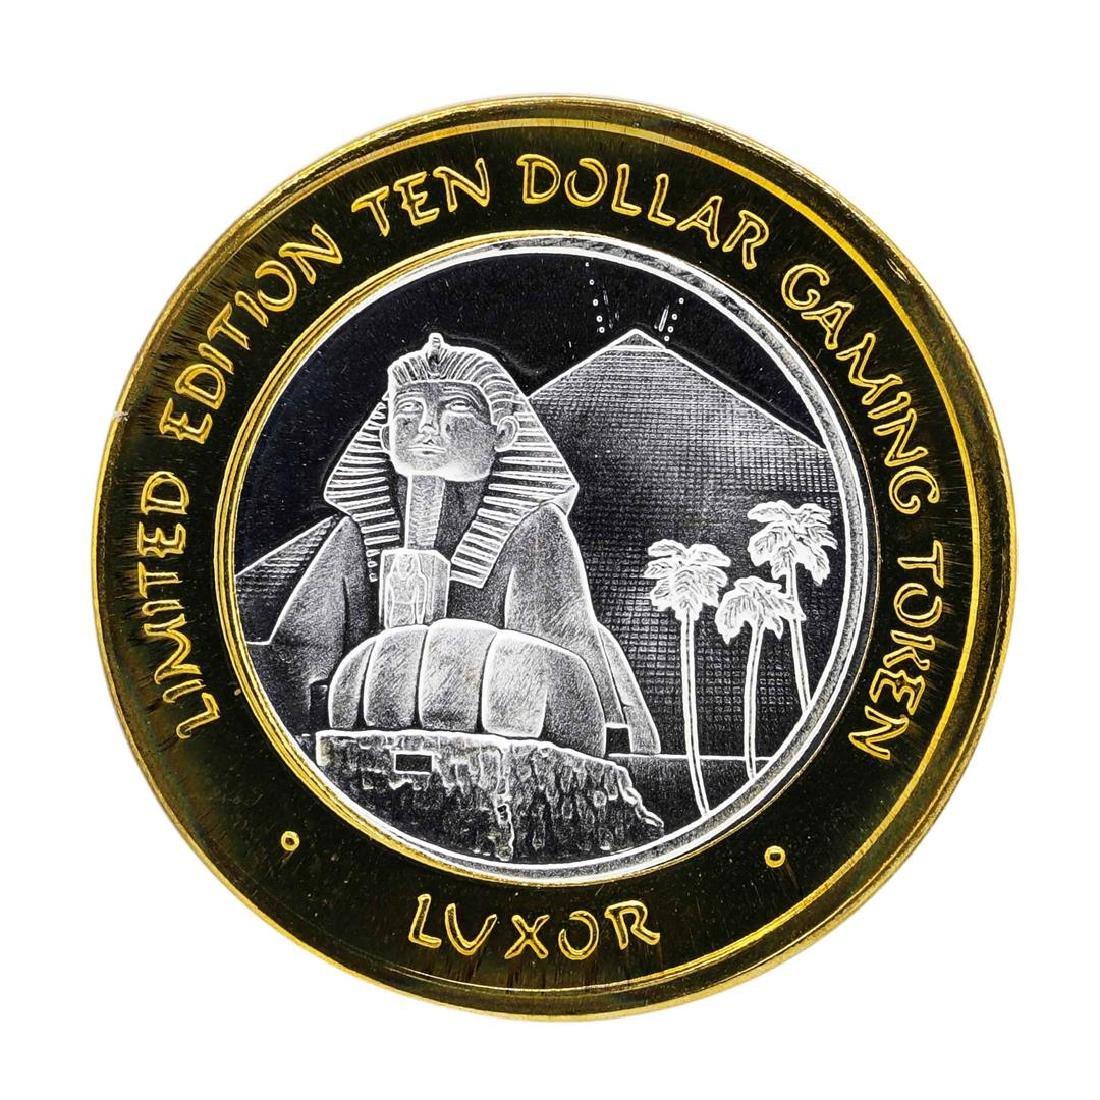 .999 Silver Luxor Las Vegas Nevada $10 Casino Limited